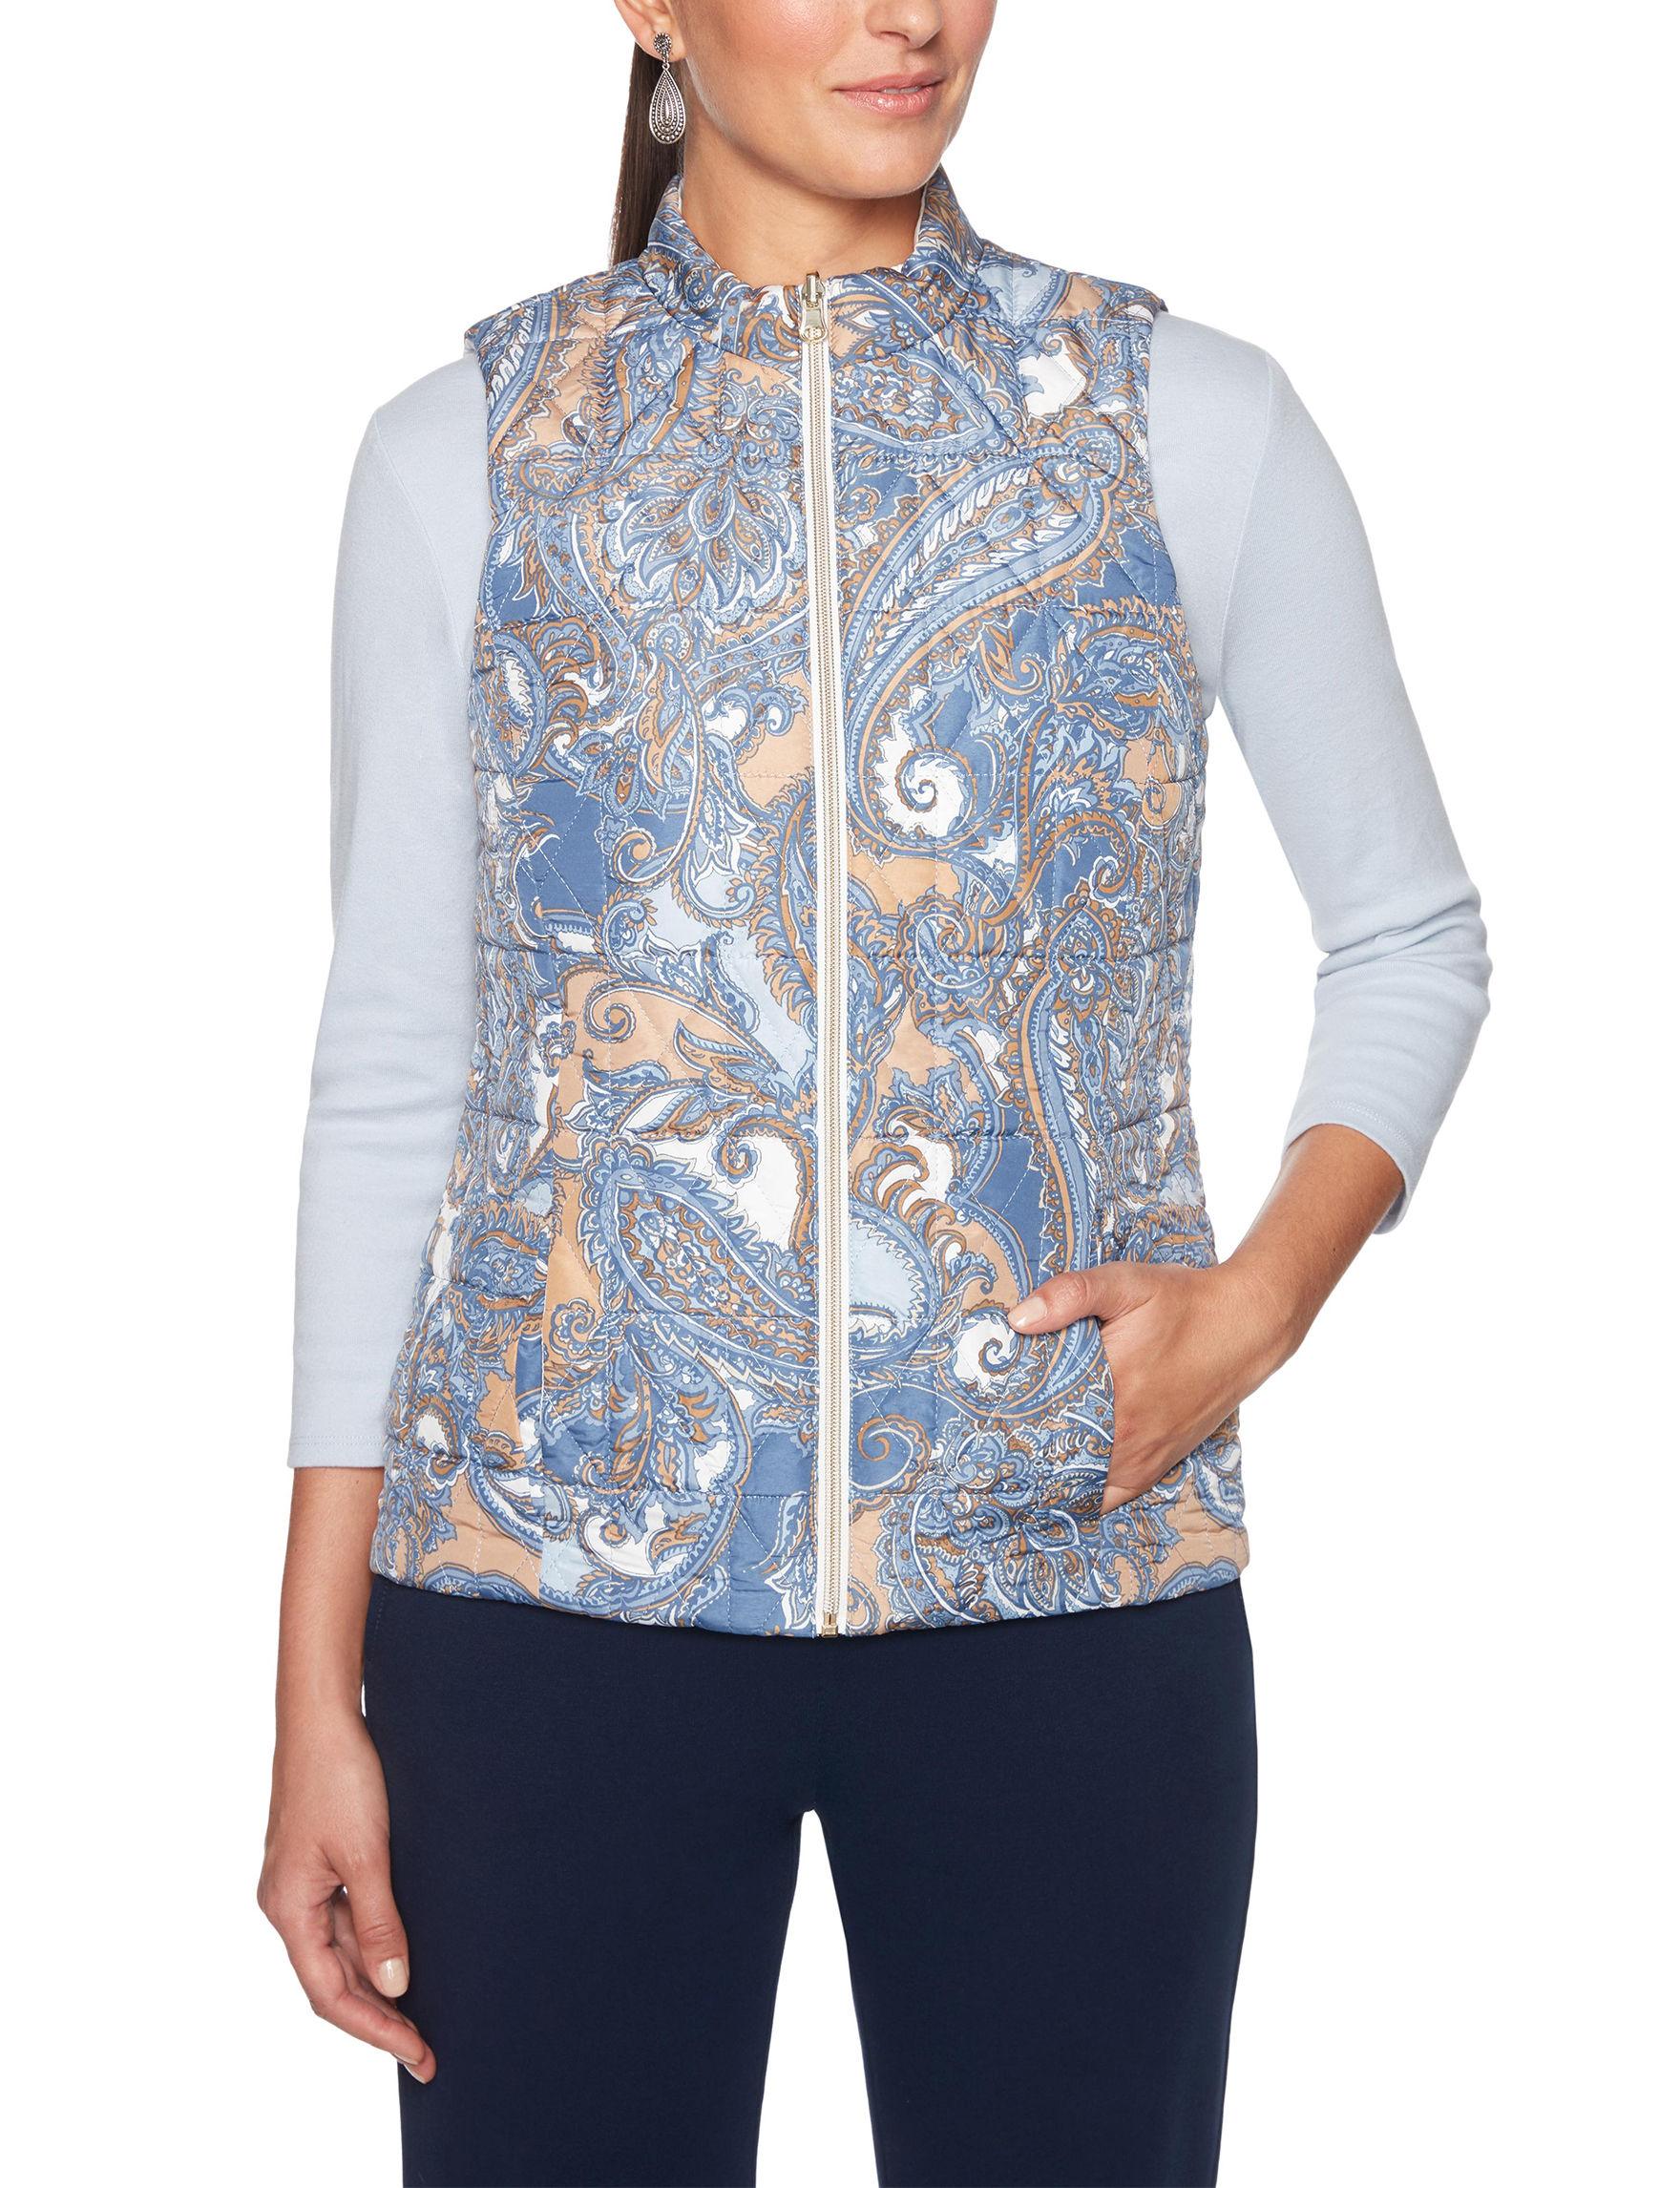 Ruby Road Blue / White Vests